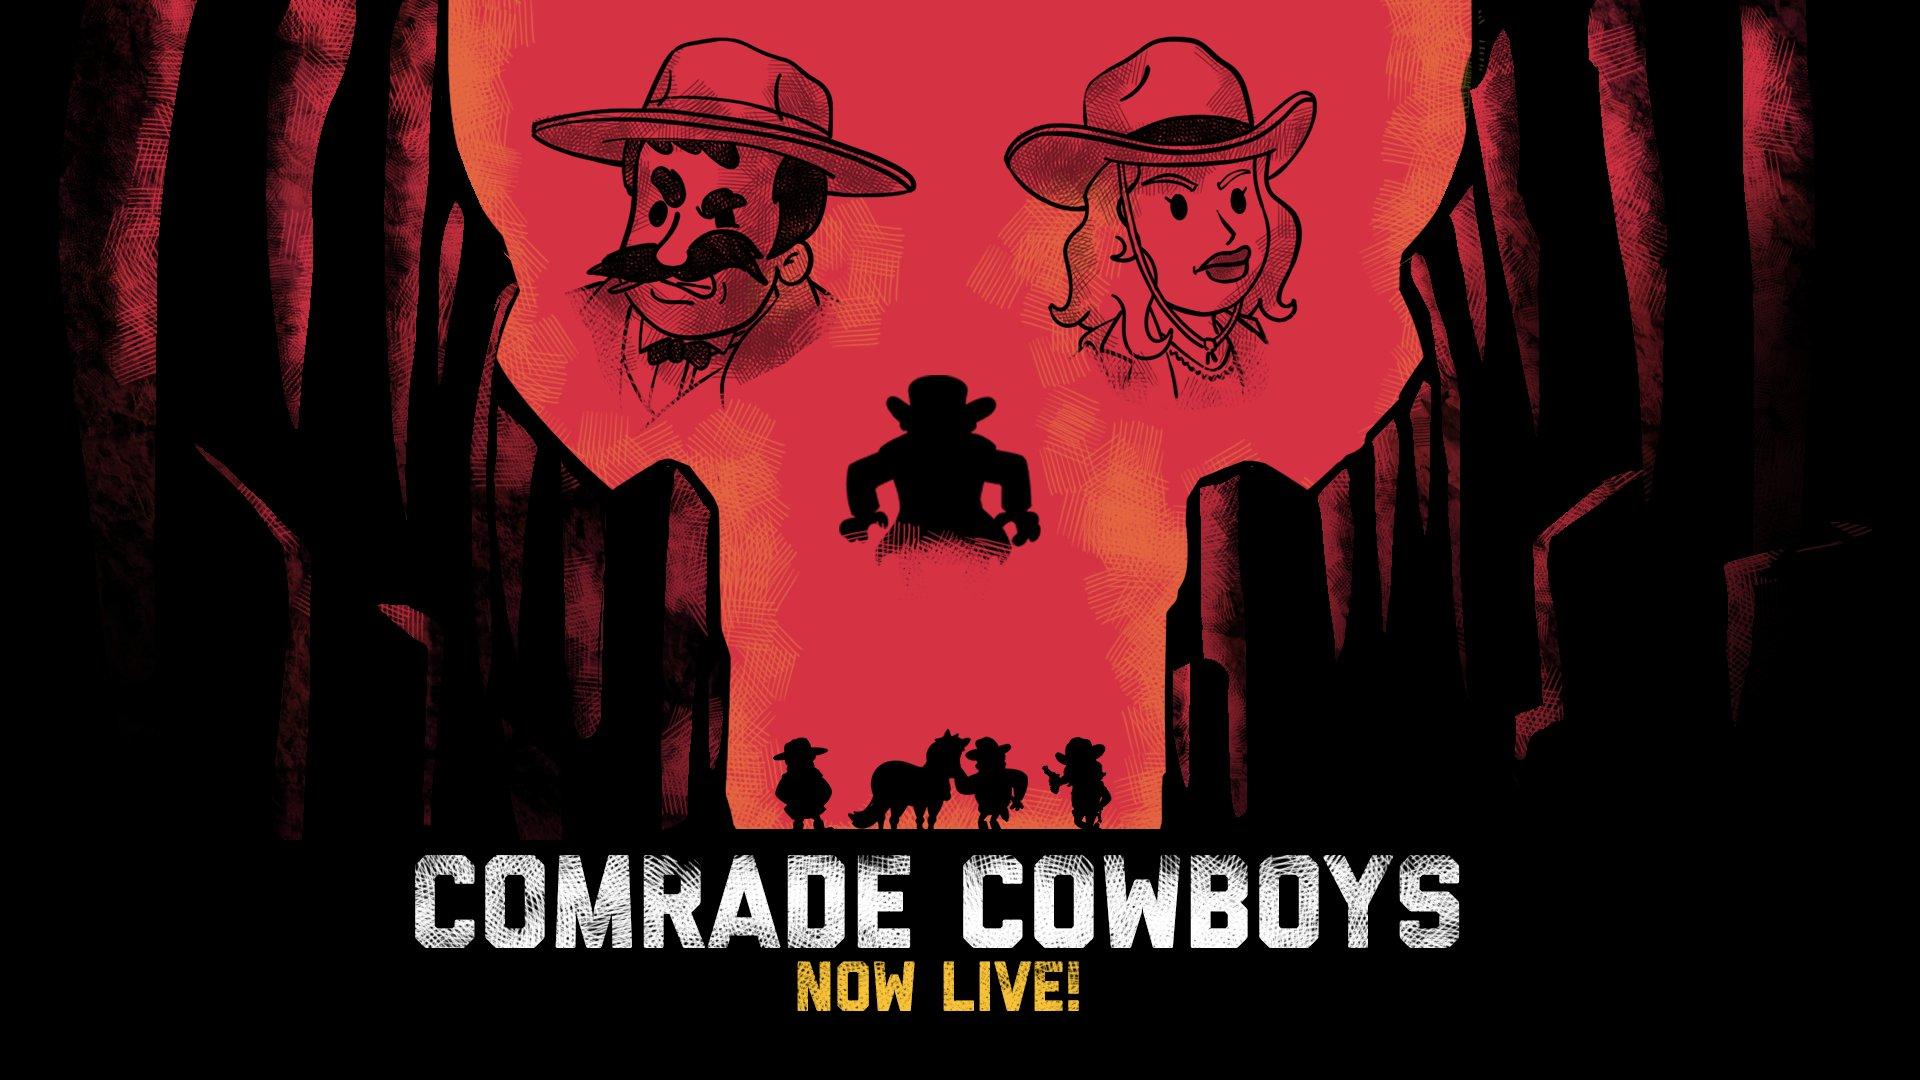 Cowboys Photo